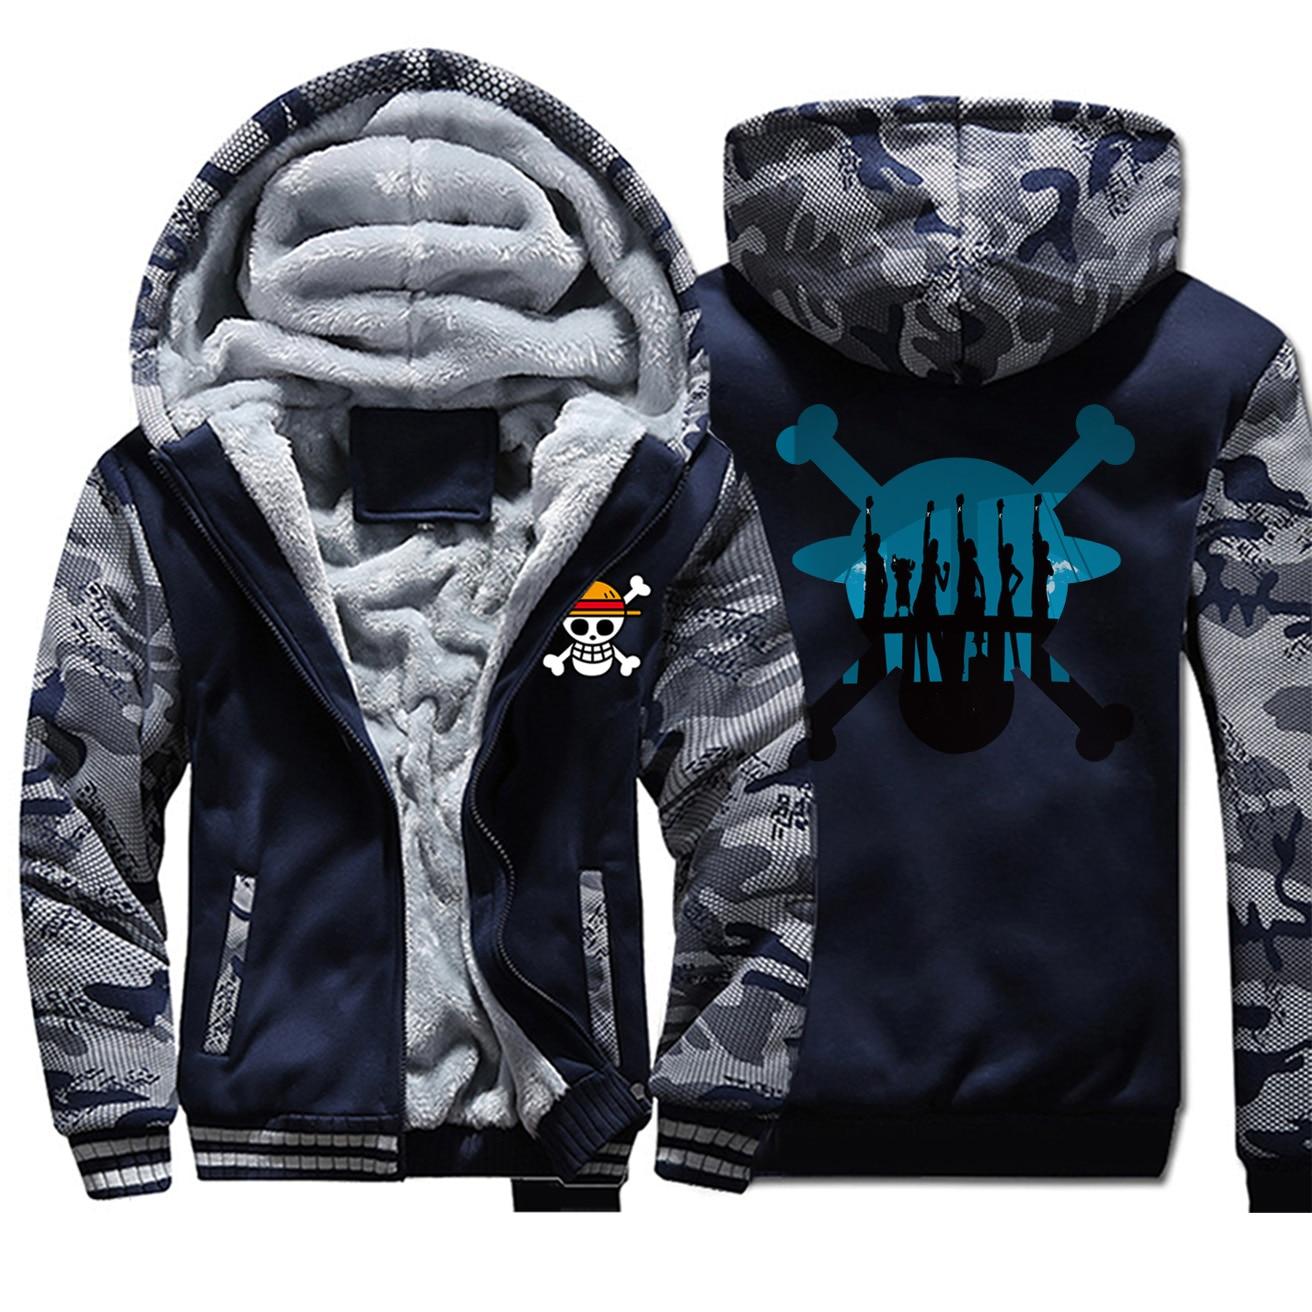 2019 Winter Japanese Anime One Piece Camouflage Hoodies Men Warm Fleece Men's Sweatshirts Harakuku Fashion Camo Jackets For Fans